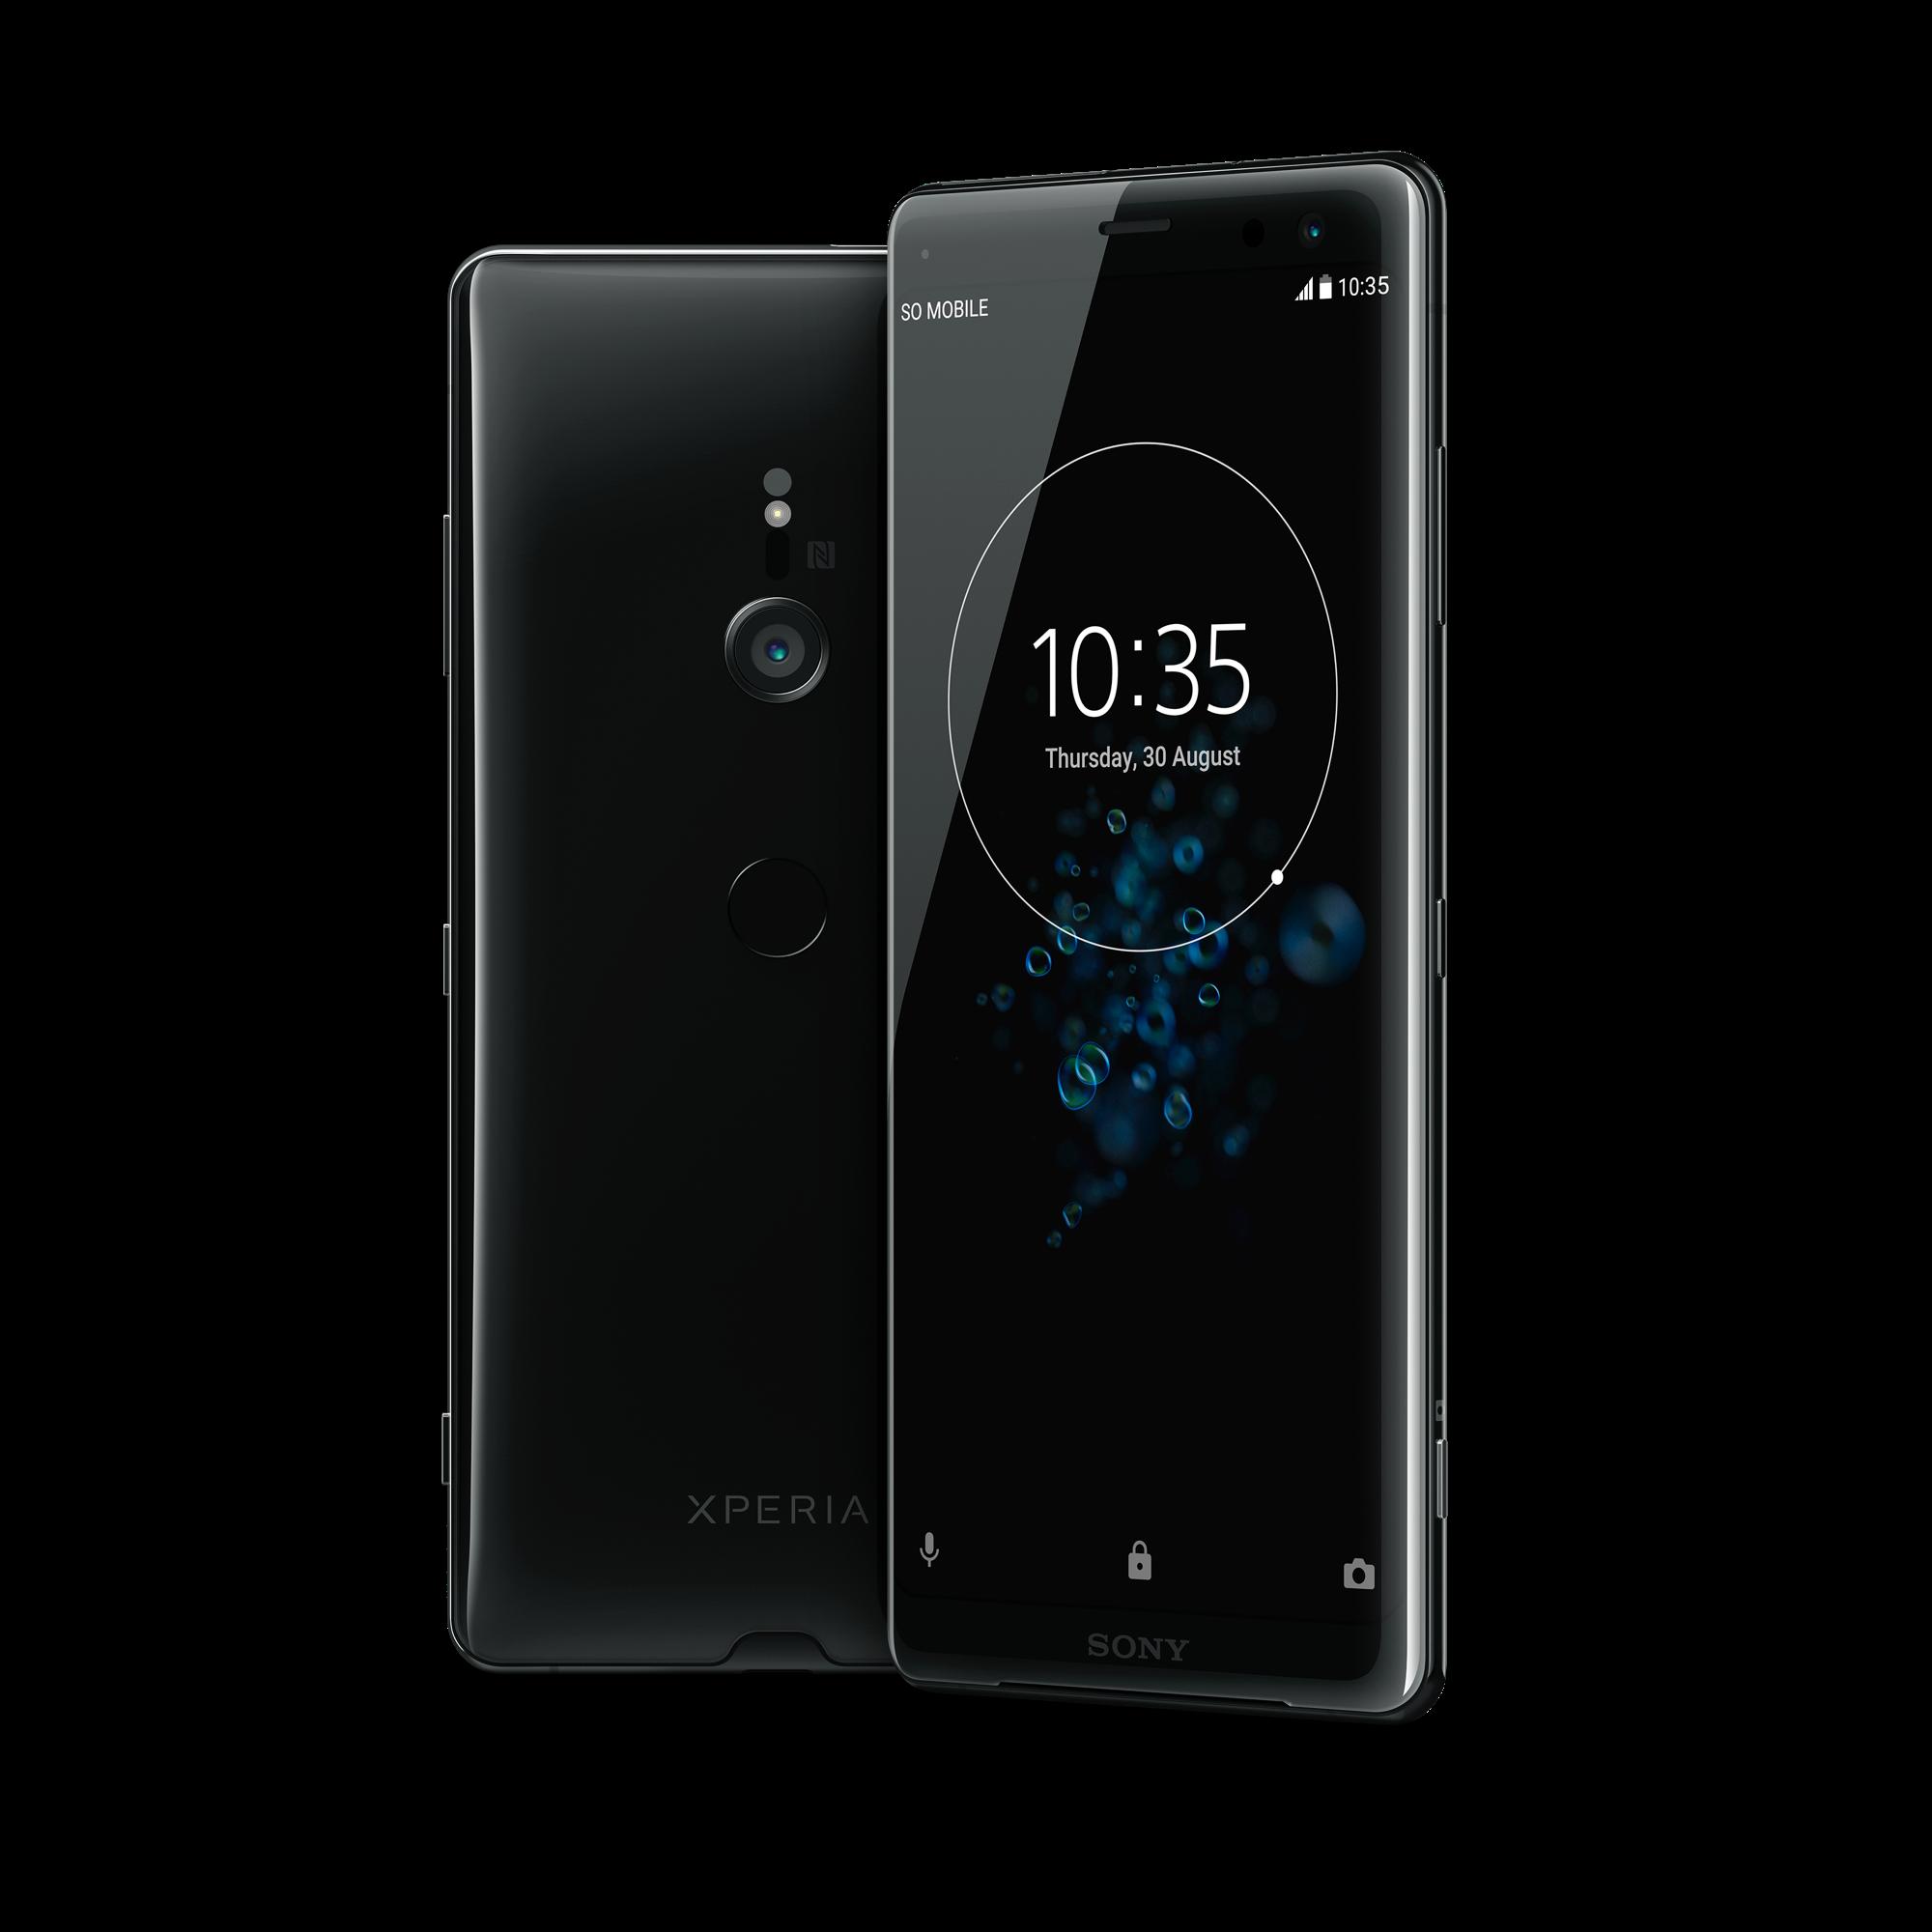 Sony Mobile、Xperia XZ3を発表。Snapdragon 845 搭載